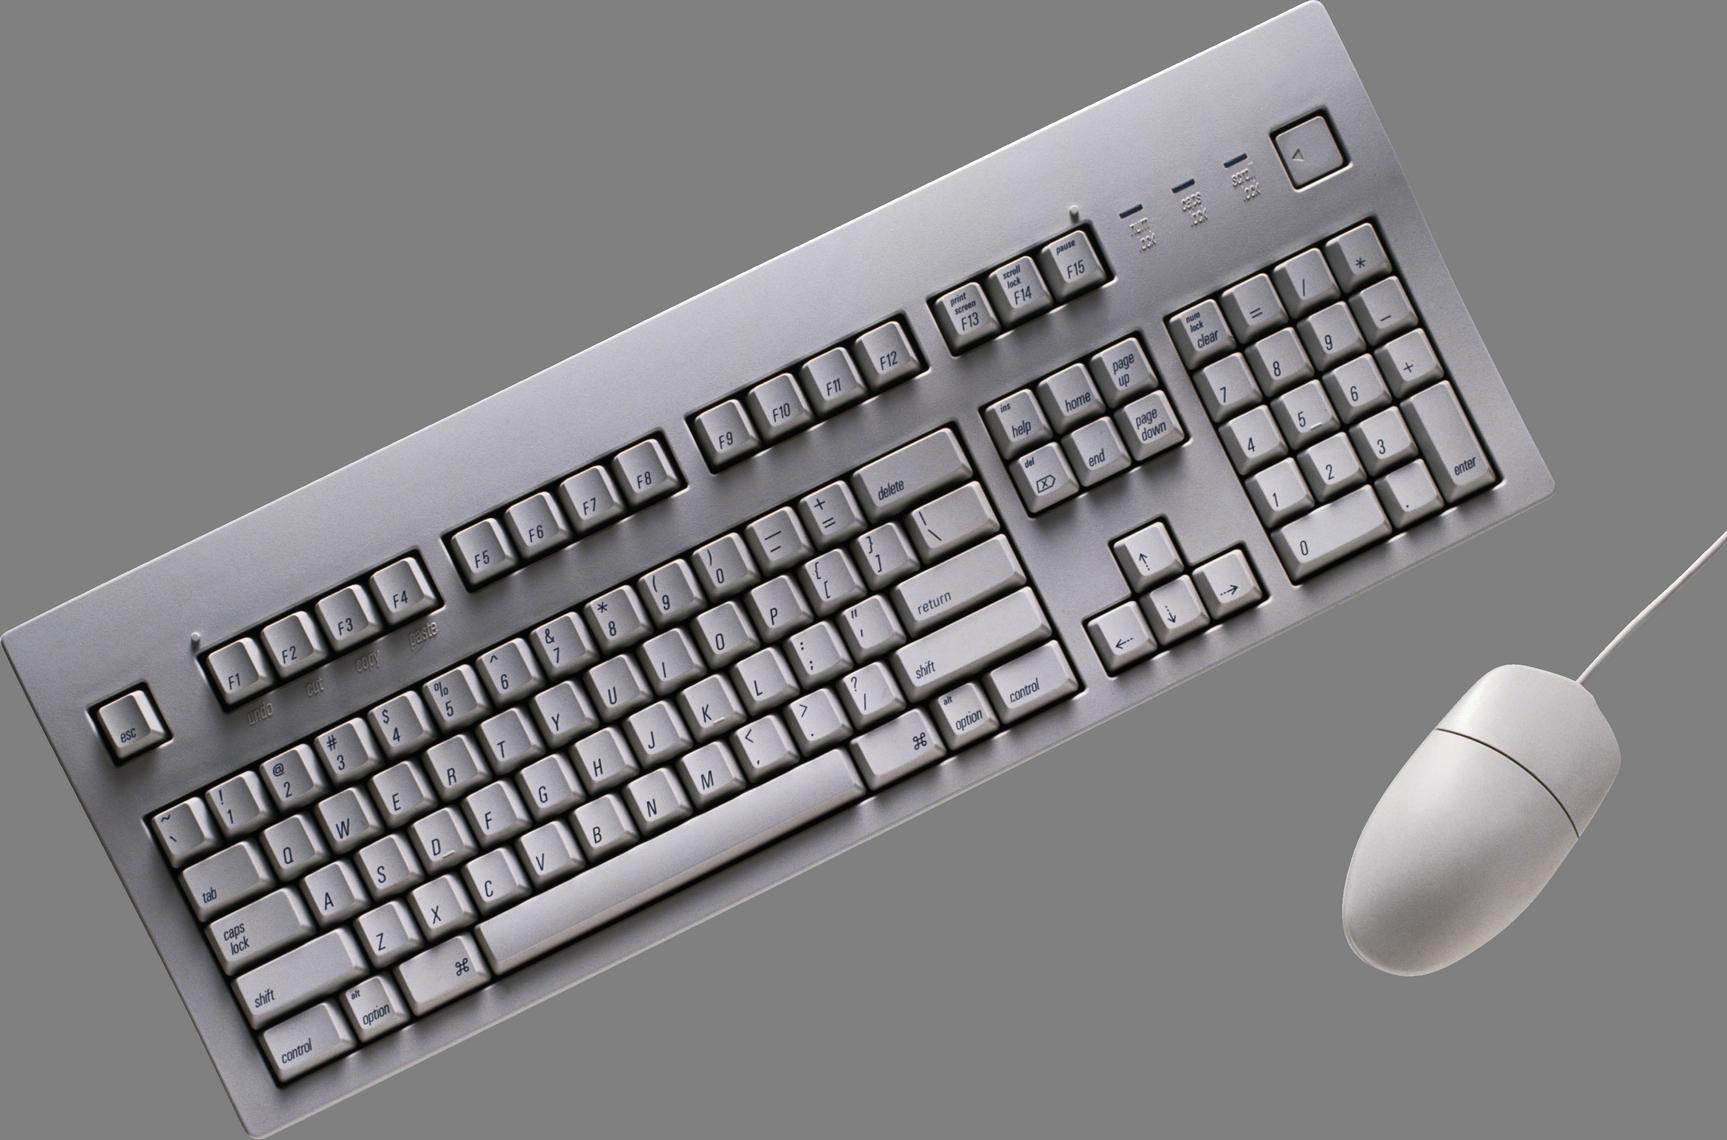 White clipart keyboard. Png image purepng free